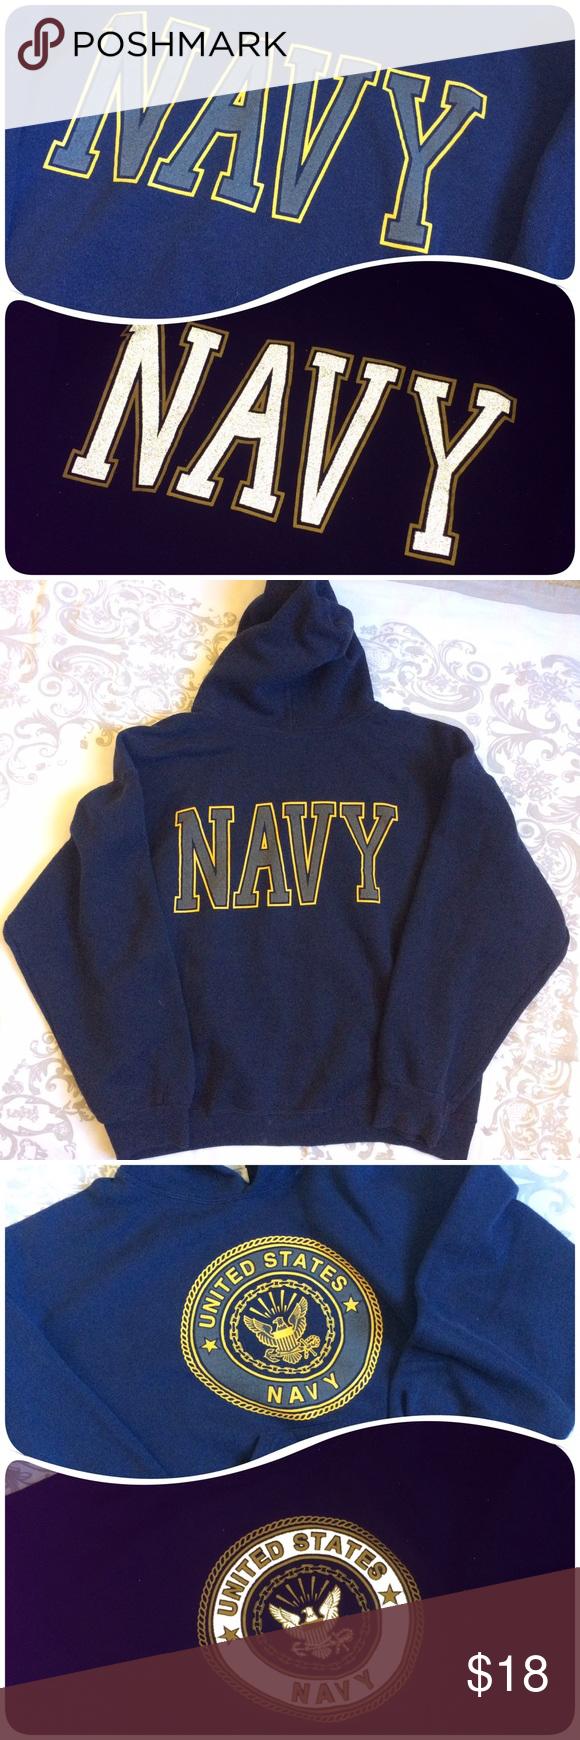 Nike Navy Crew Neck Sweatshirt Size Large 0920 Crew Neck Sweatshirt Sweatshirts Sweatshirt Shirt [ 1740 x 580 Pixel ]